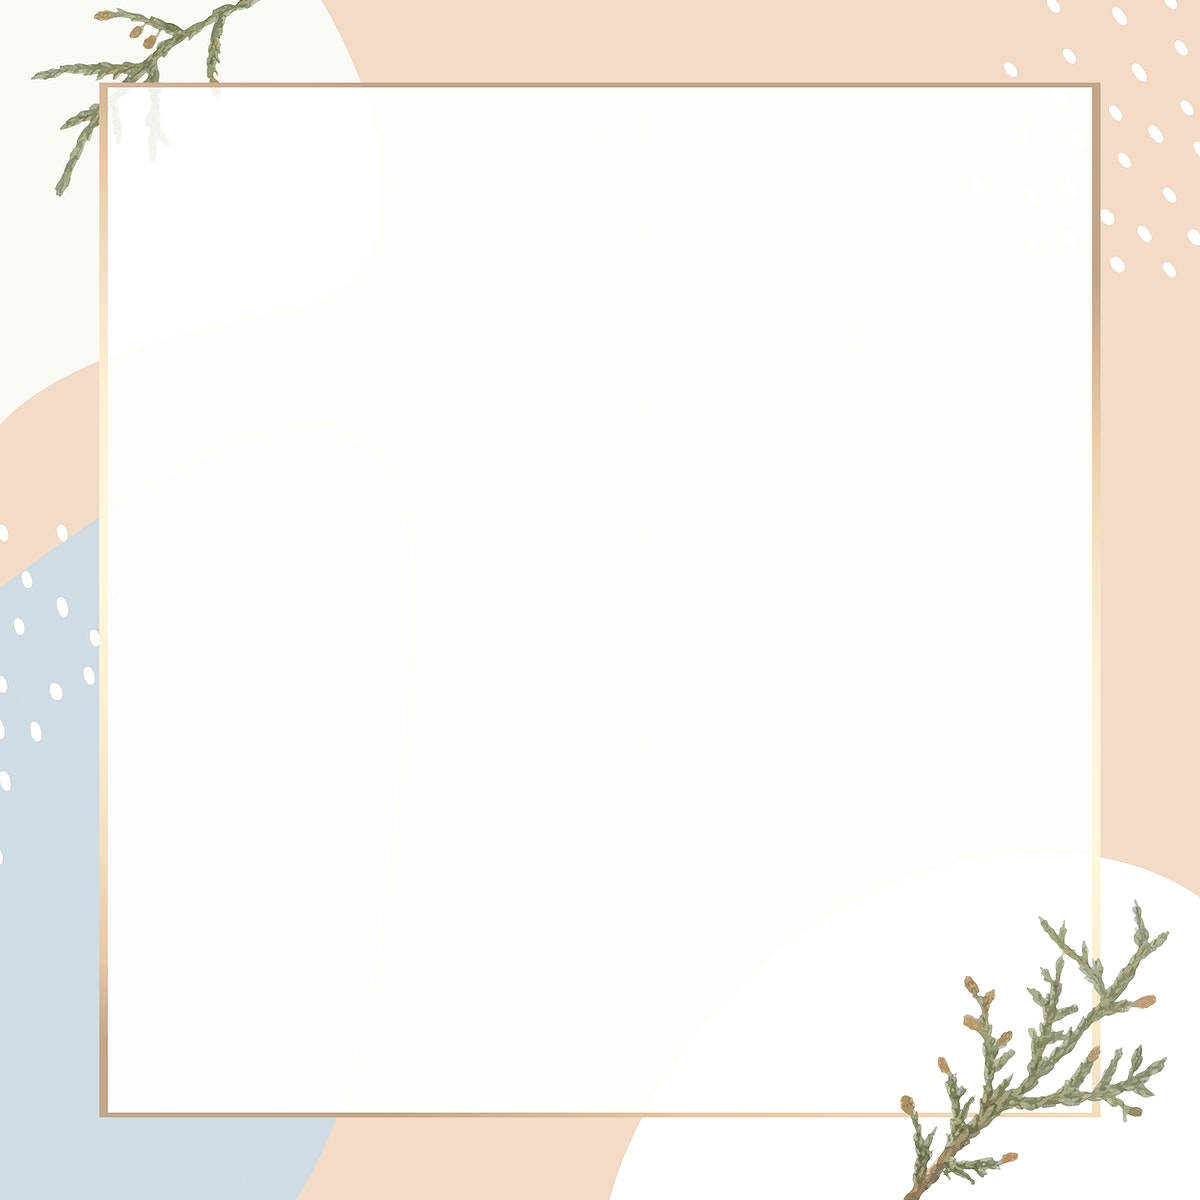 Square gold frame on minimal patterned background vector